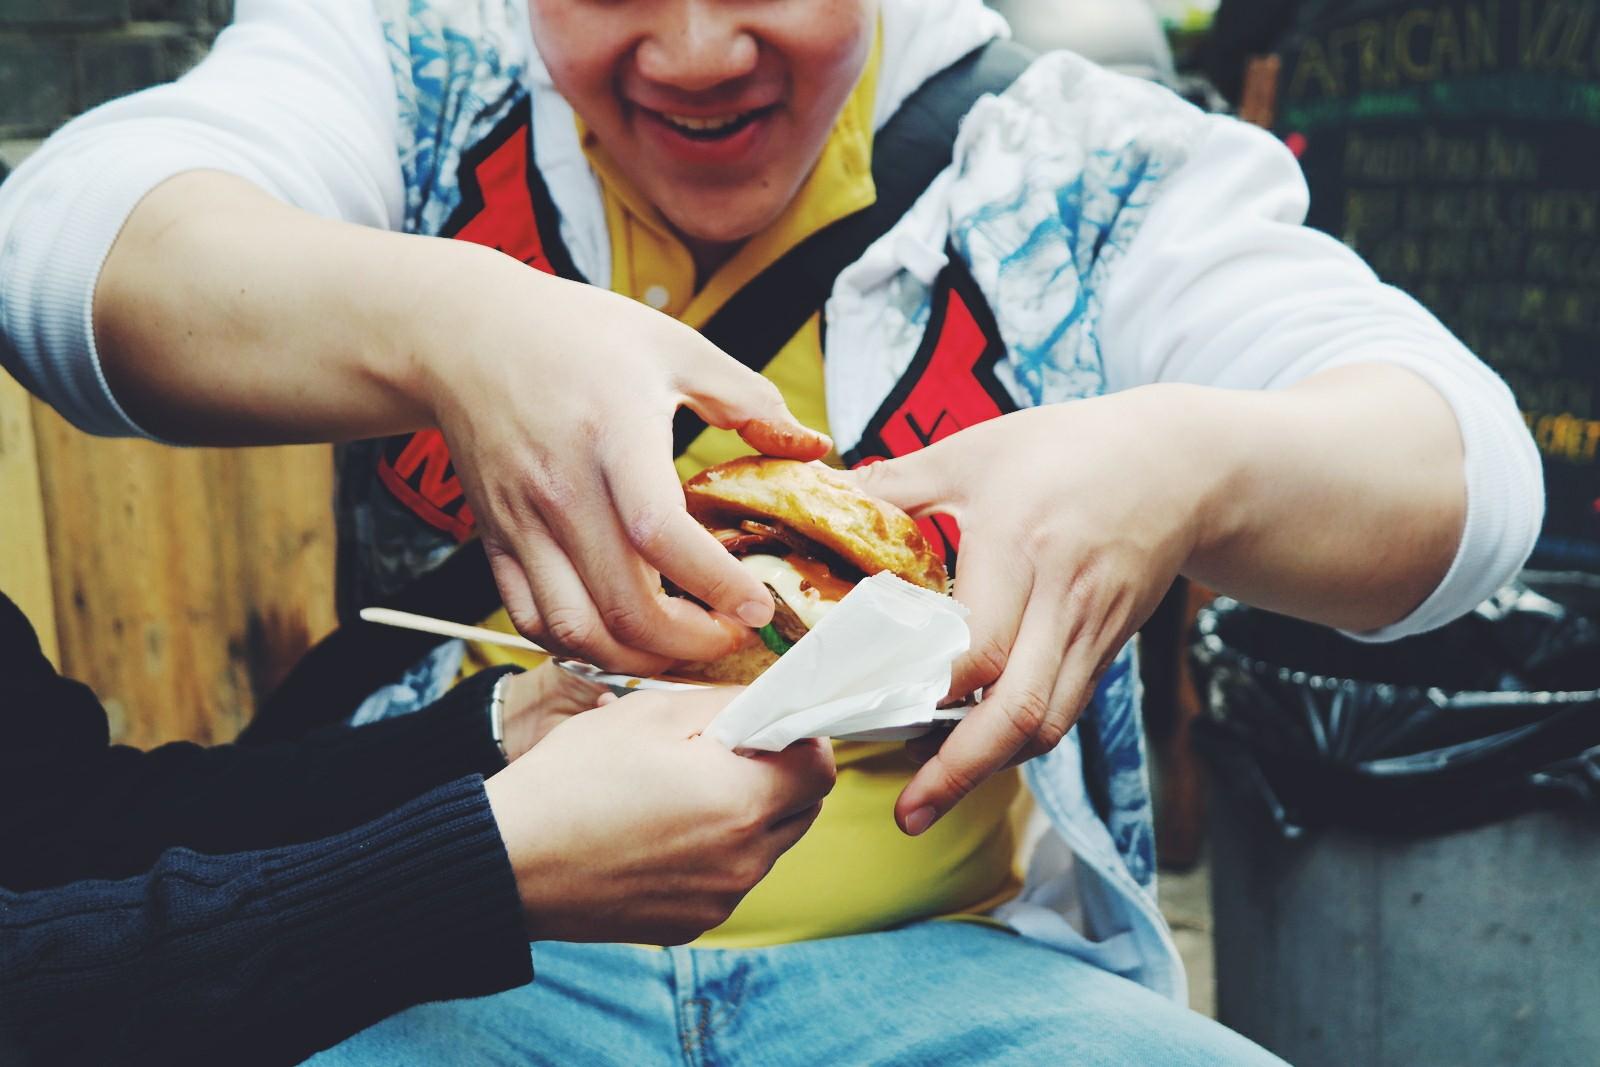 Food-addicts-African-Volcano-burger-recipe-beef-tomato-ketchup-peri-peri-sauce-sandwich-Maltby-Street-Market-Ropewalk-London-Bermondsey-marché-gourmand-Londres-by-usofparis-blog